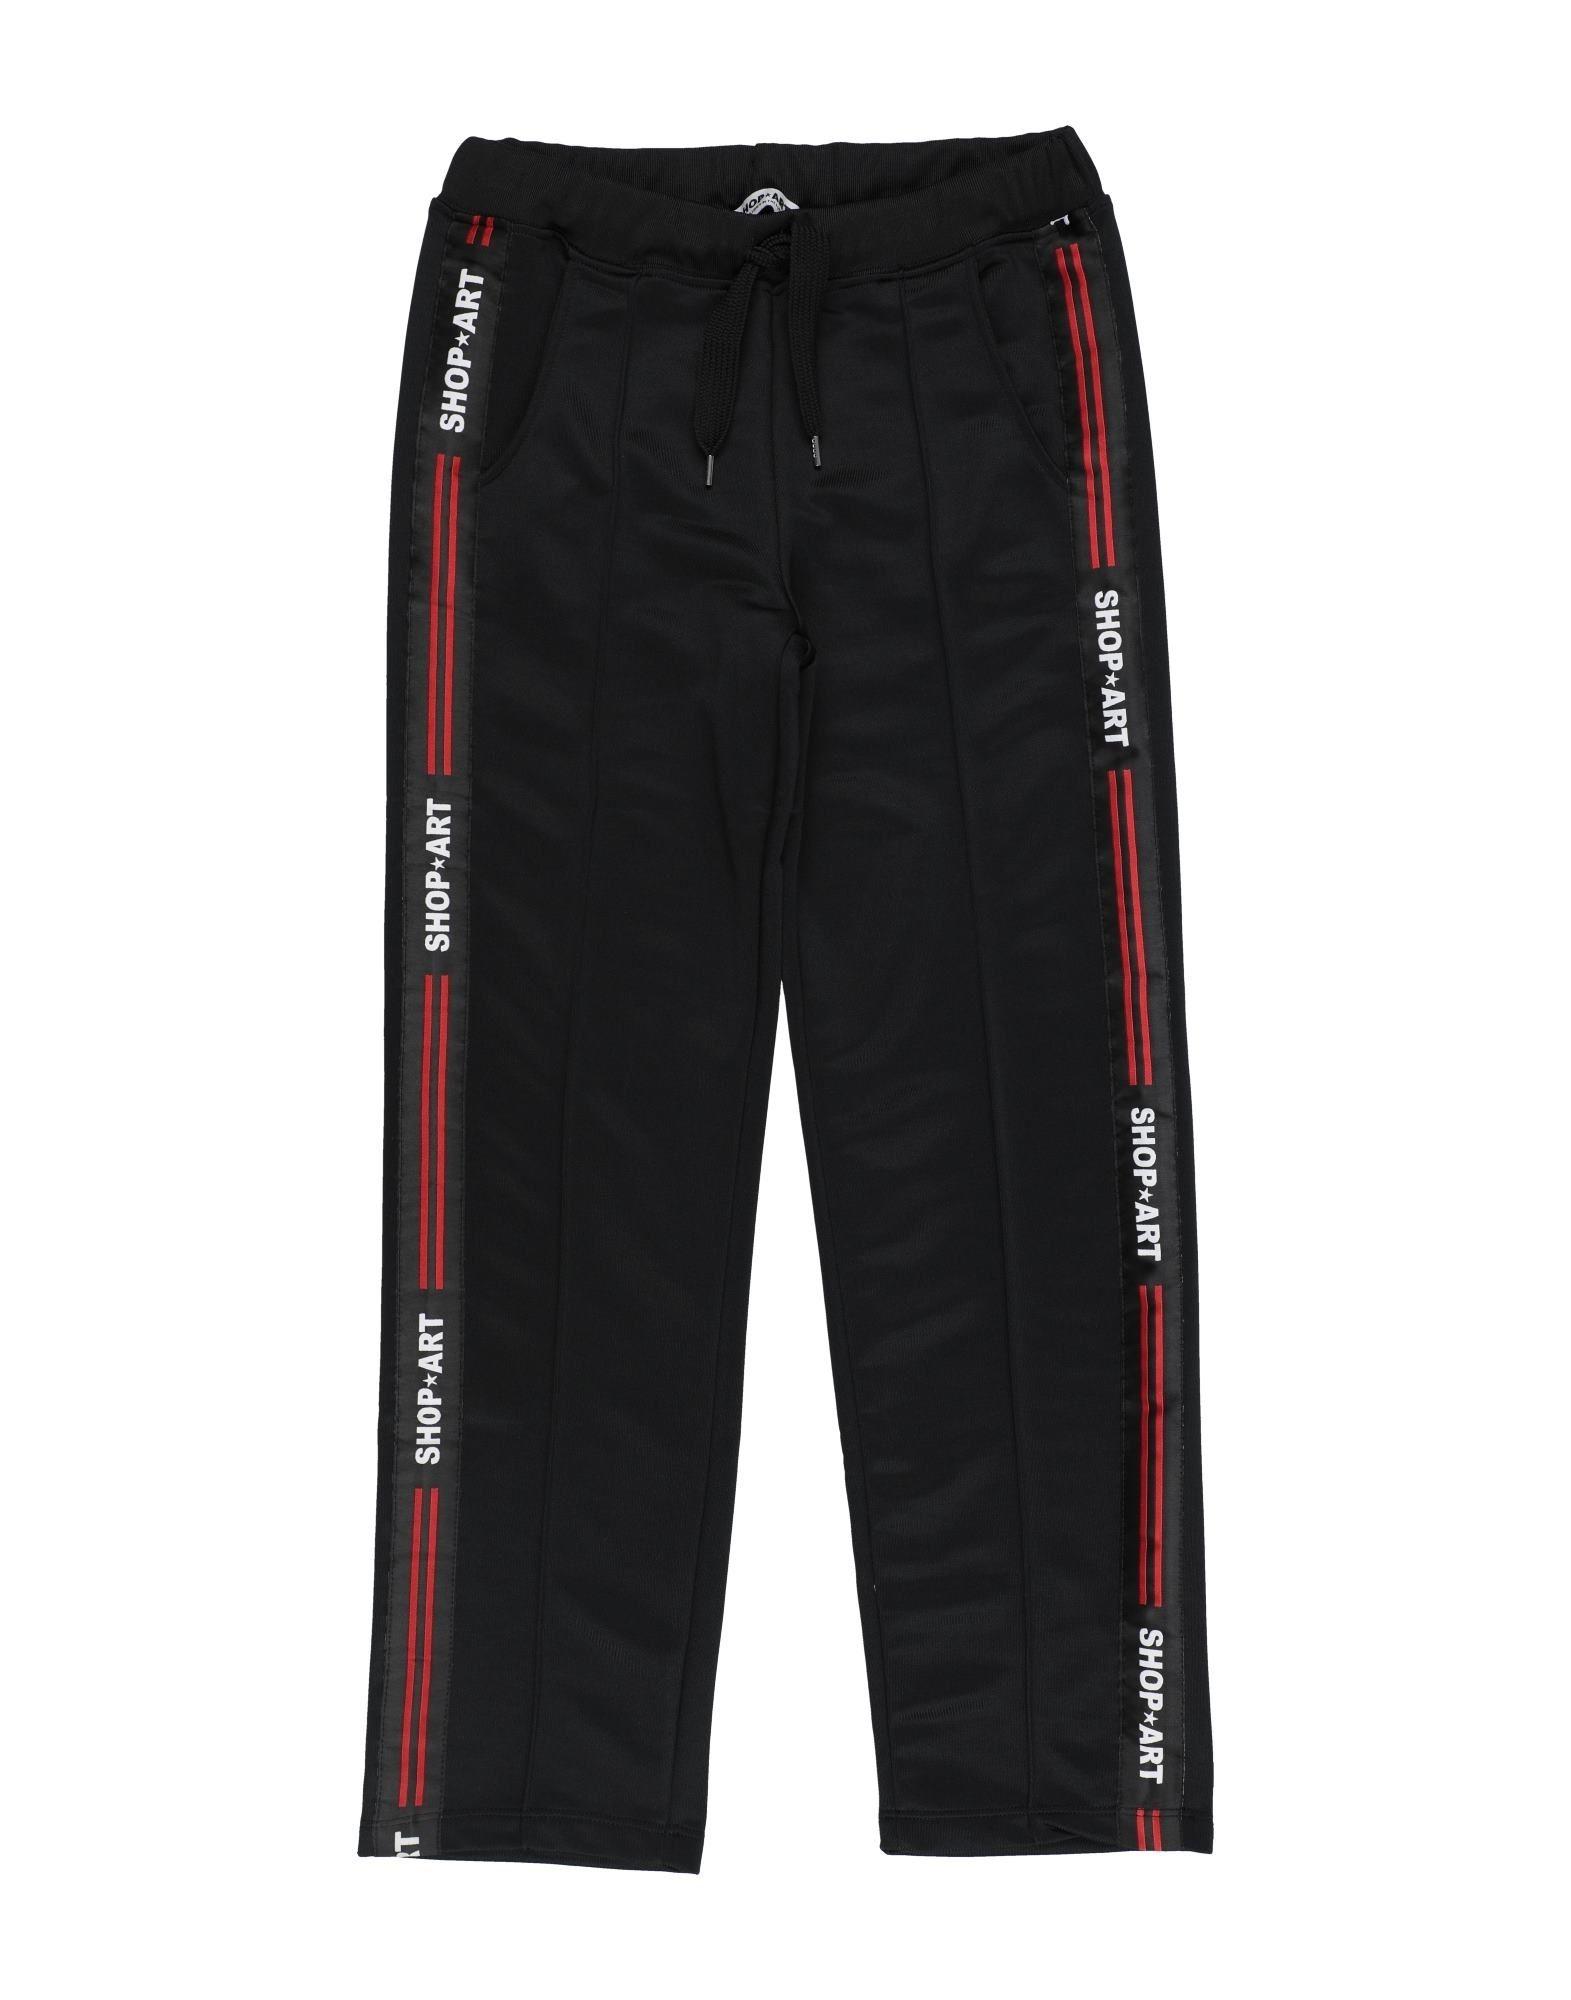 Shop ★ Art Kids' Shop ★ Art Casual Pants In Black